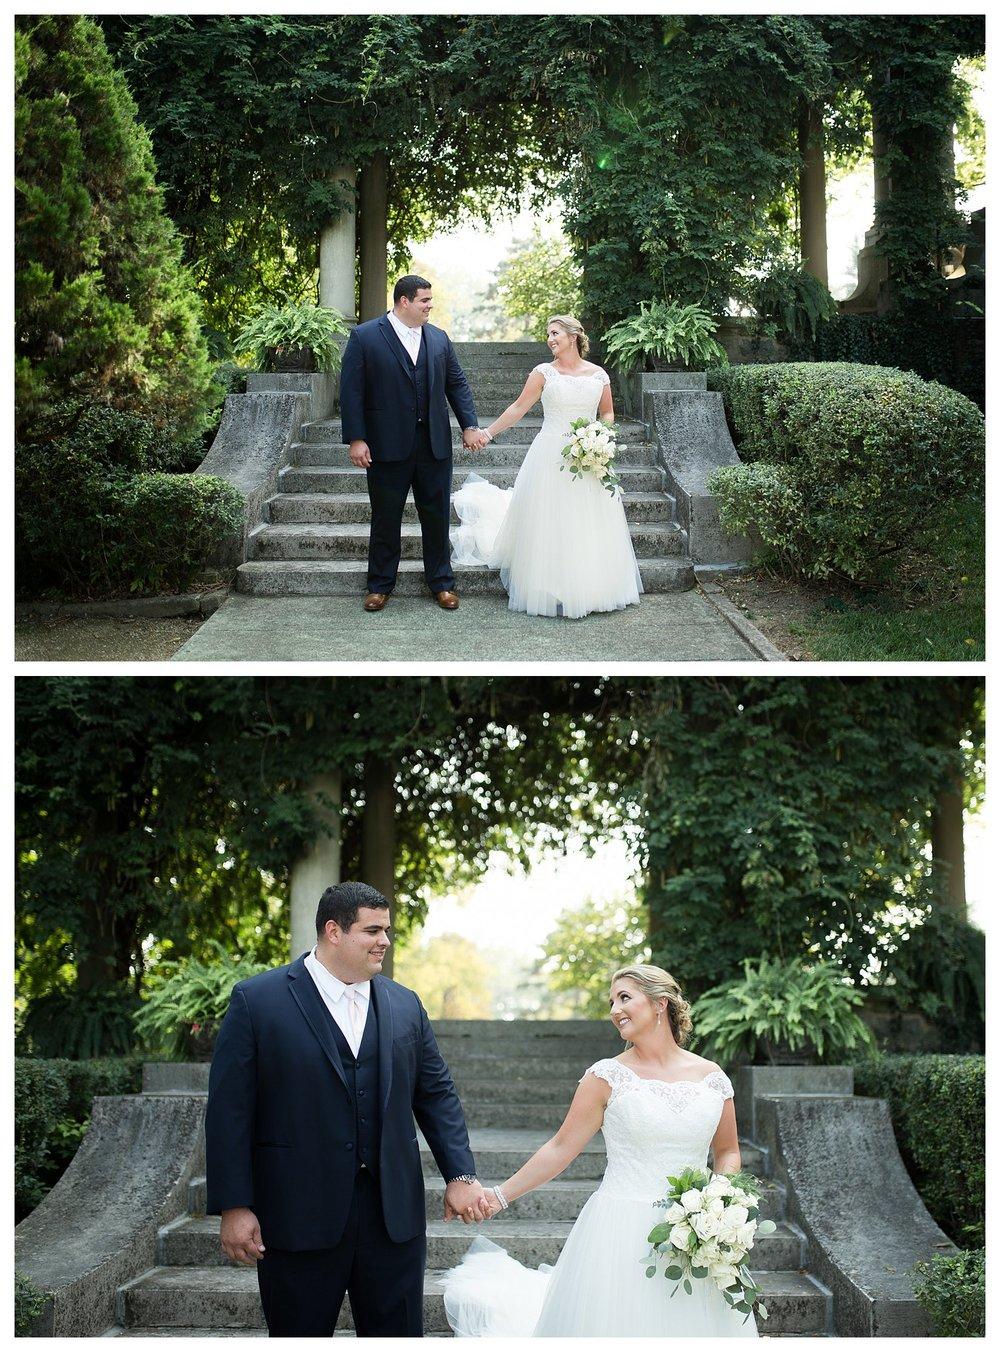 laurel-court-wedding-everleigh-photography-cincinnati-wedding-photographer-northern-ky-wedding-photographer-27